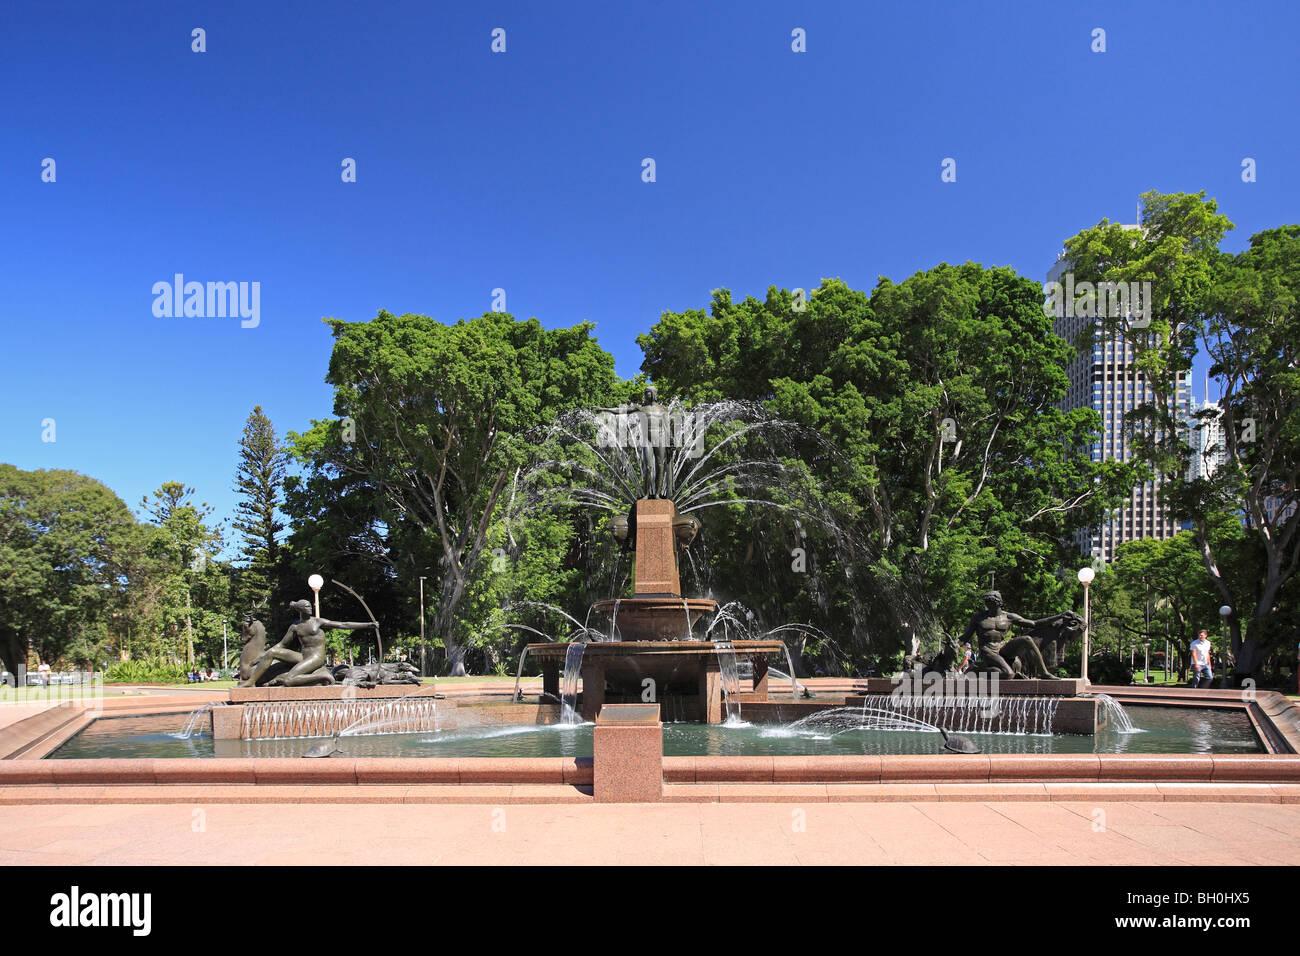 archibald-fountain-is-a-distinctive-art-deco-showpiece-in-hyde-park-BH0HX5.jpg